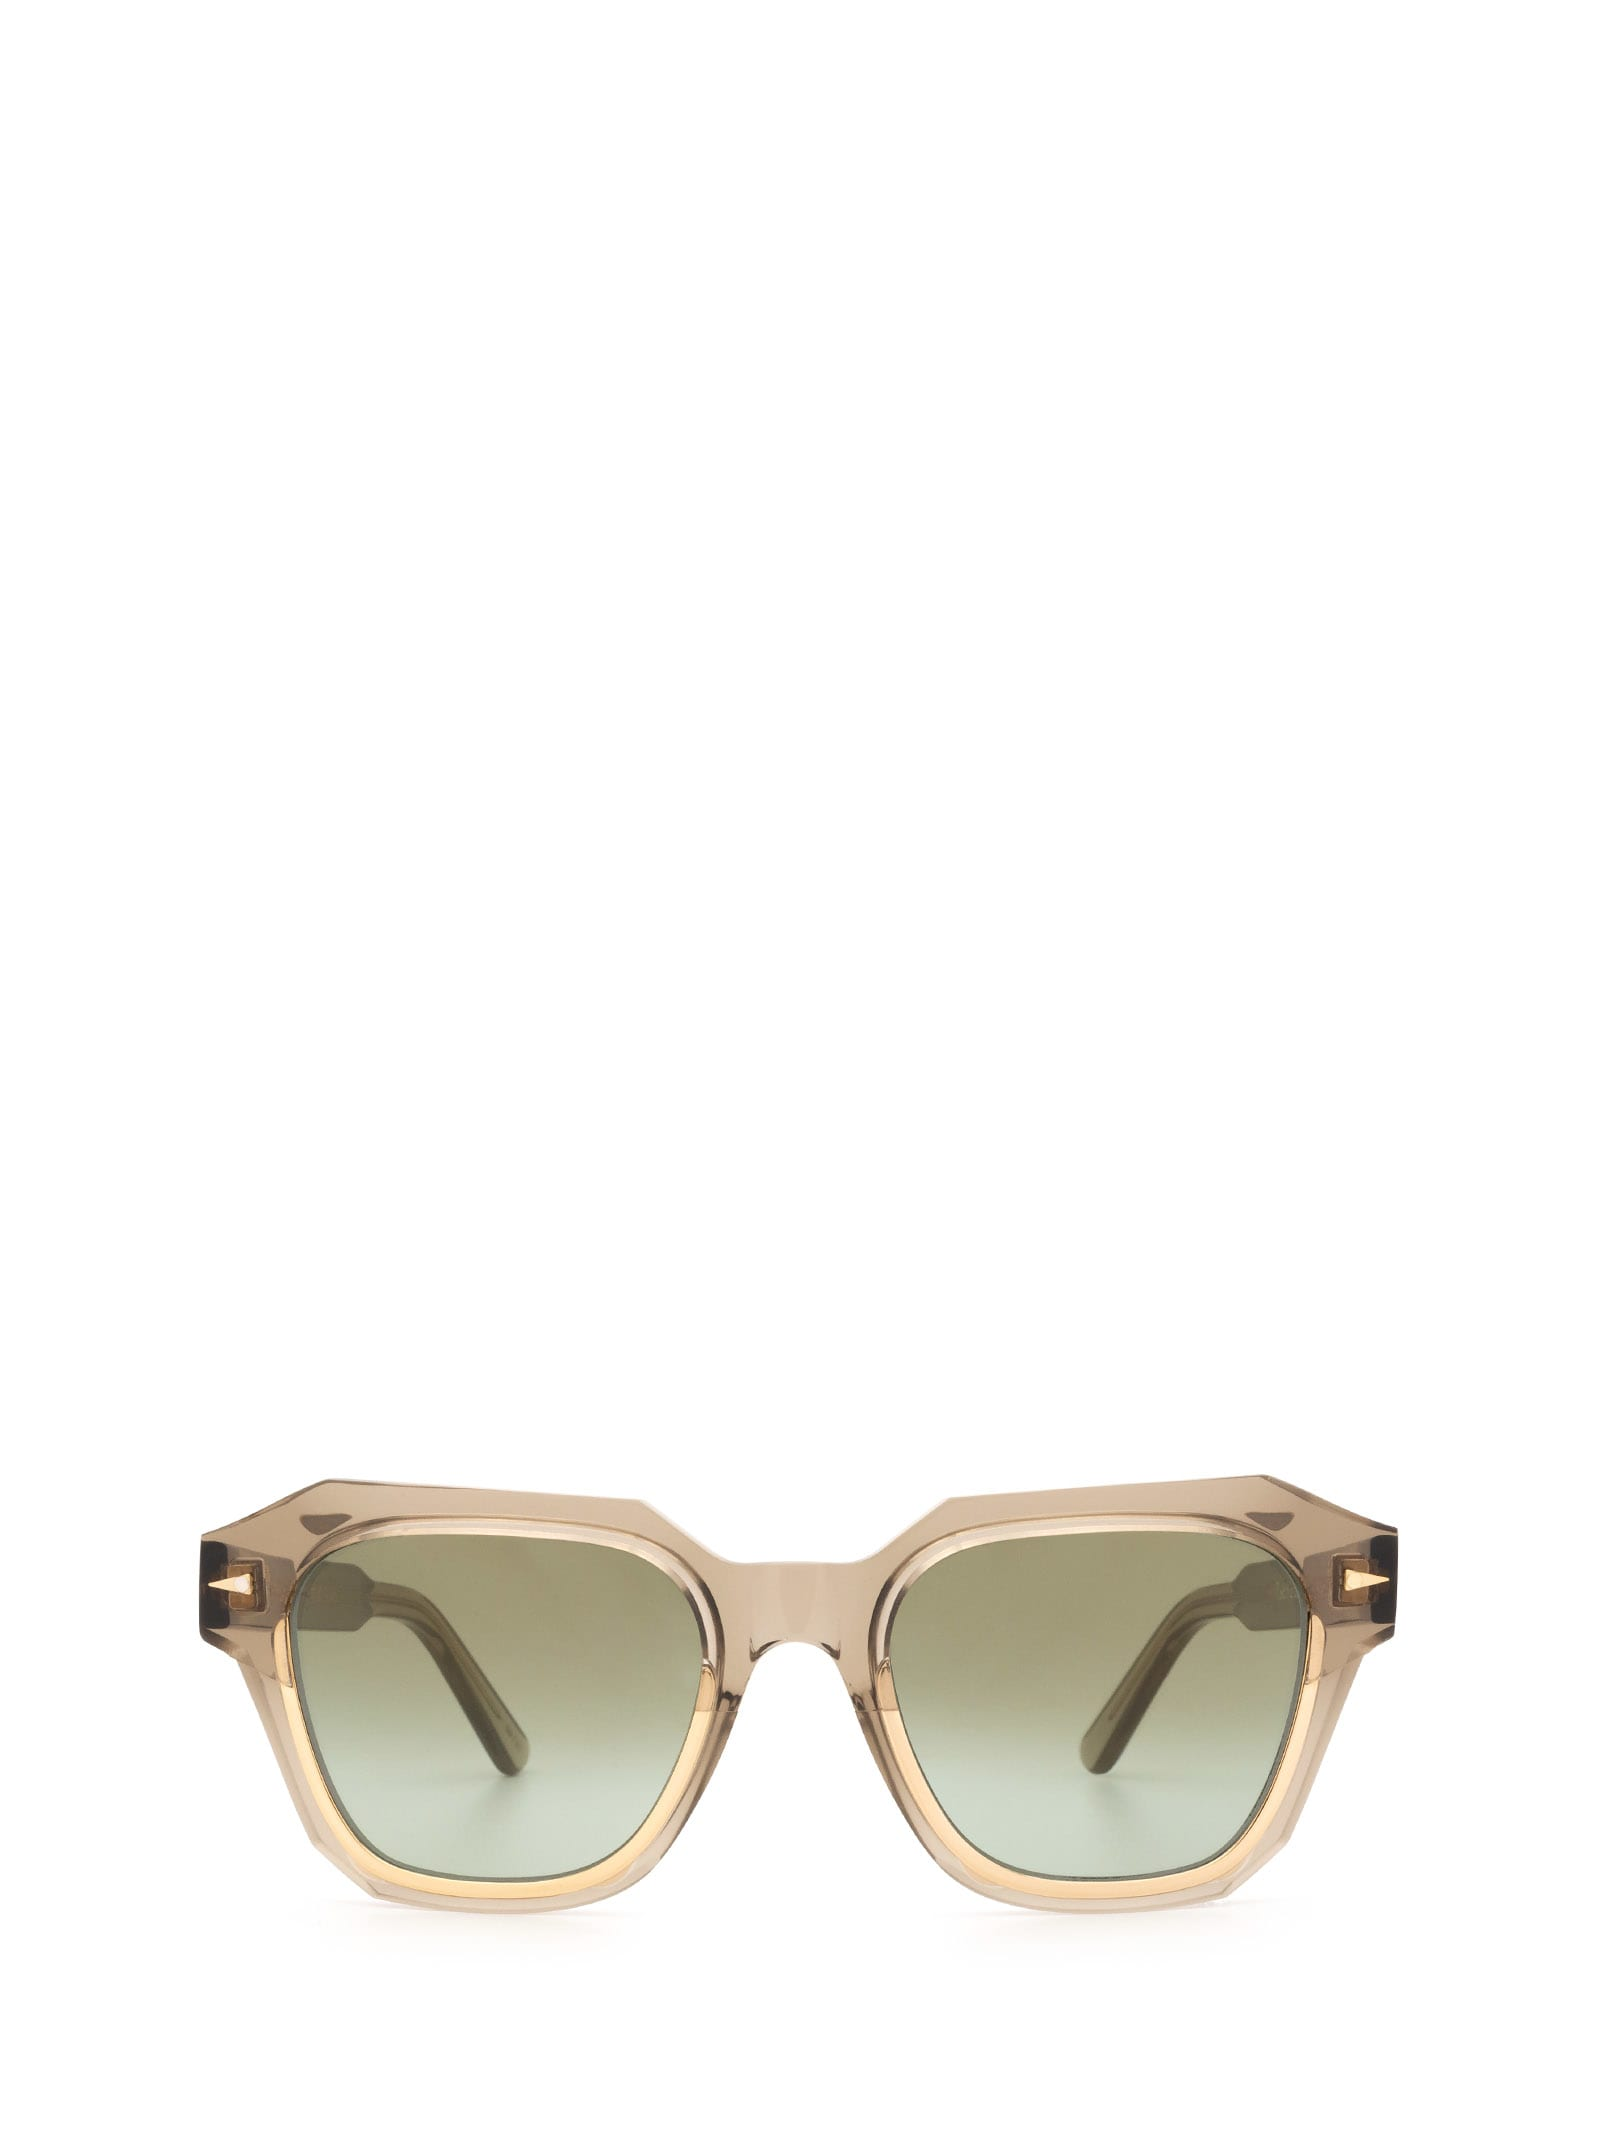 AHLEM Ahlem Pont Marie Smoked Light Sunglasses